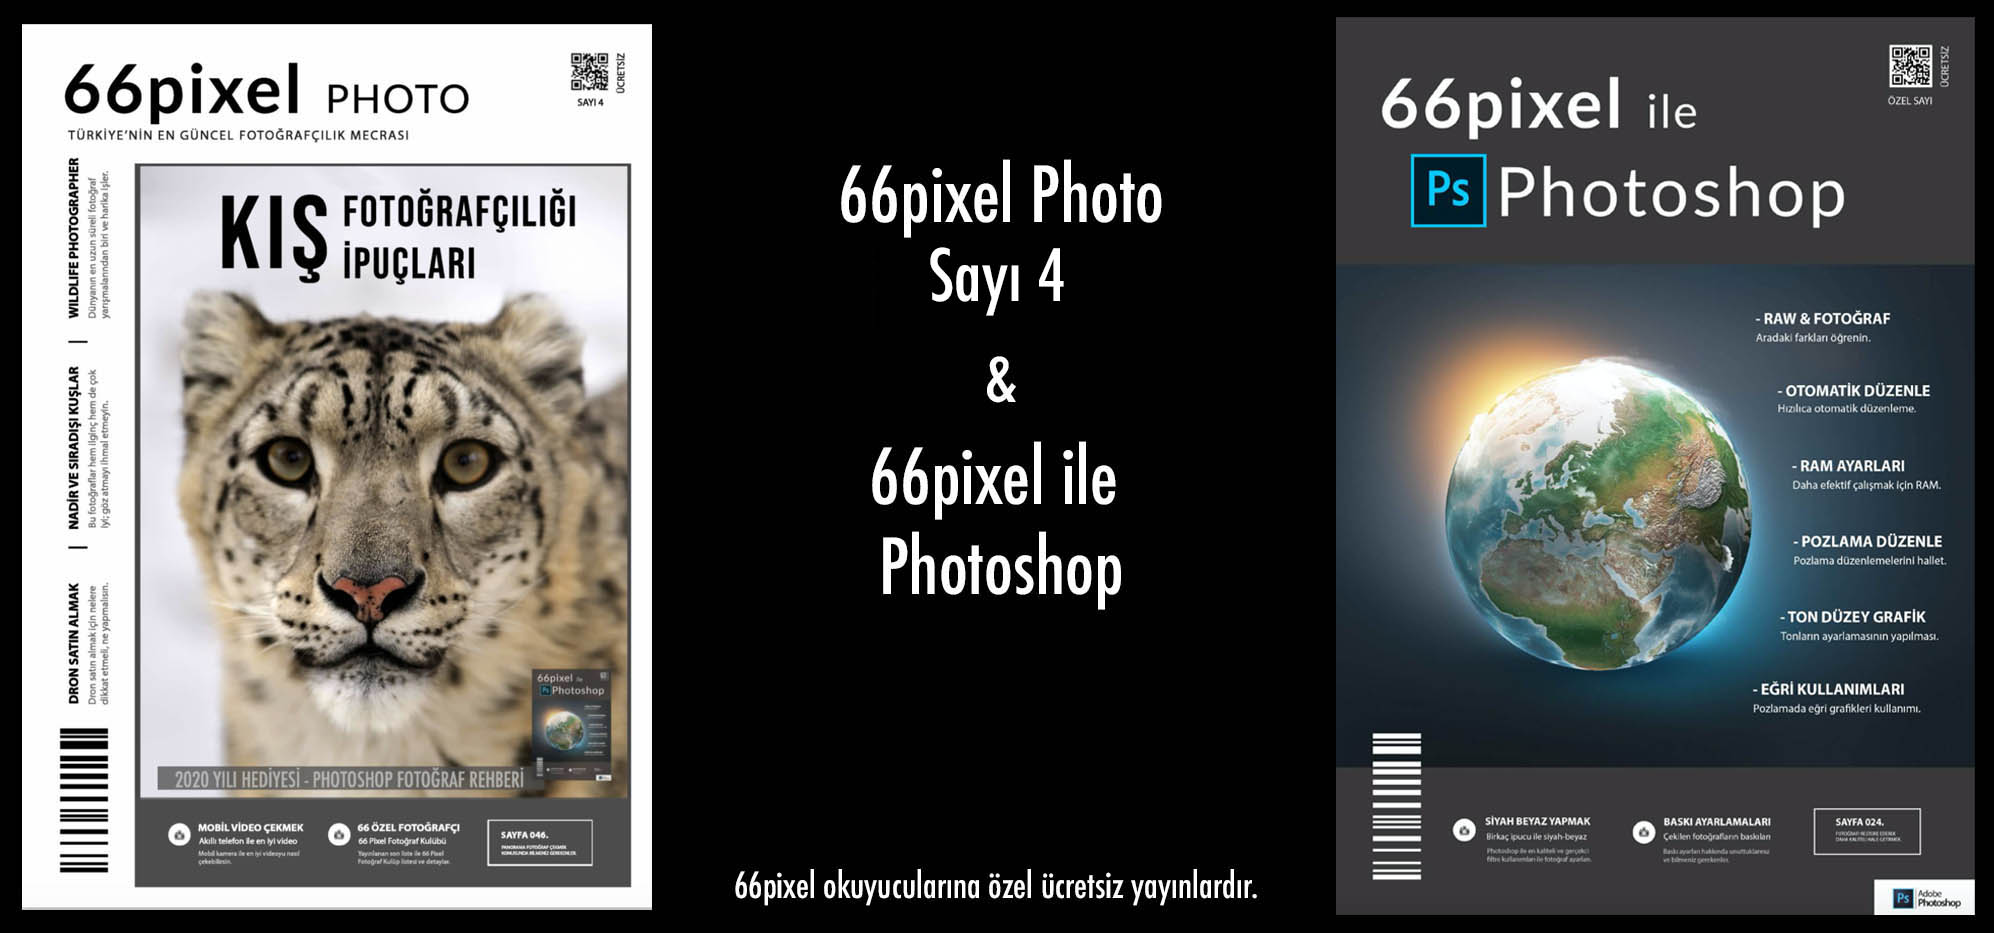 Fotoğrafçılık Dergisi - 66pixel photo derrgisi